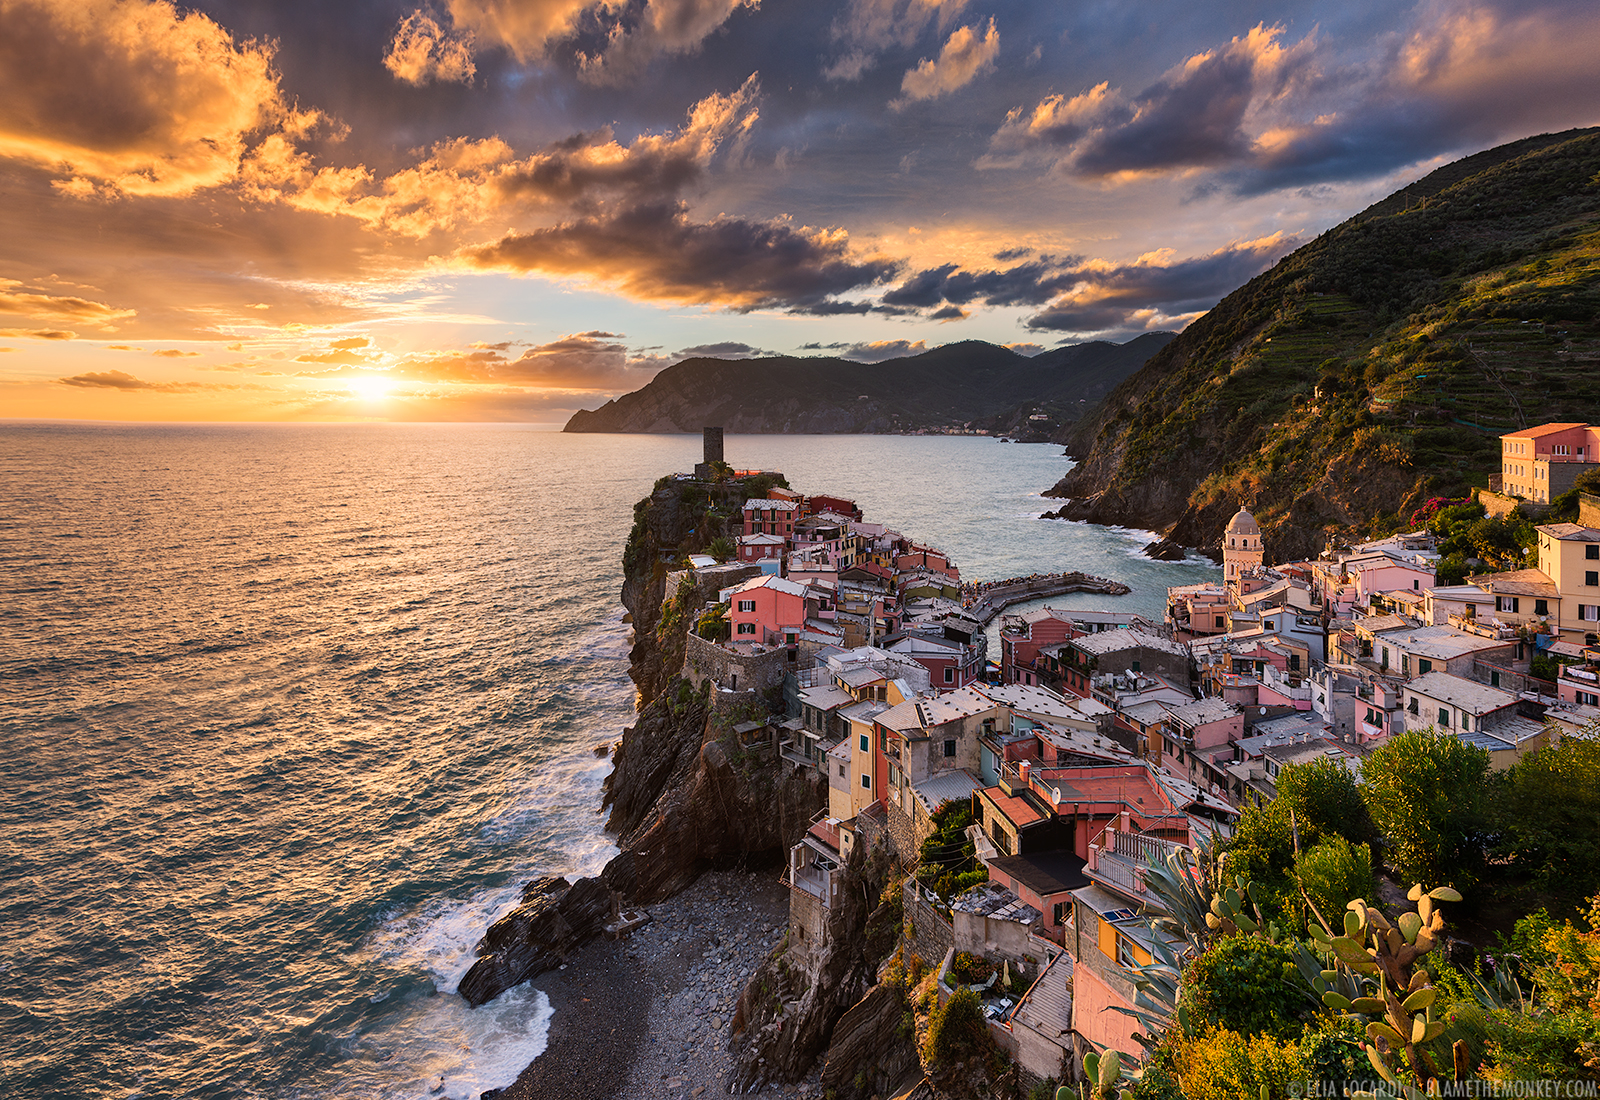 Elia-Locardi-Travel-Photography-Song-Of-The-Sea-Vernazza-Cinque-Terre-Italy-1600-WM.jpg